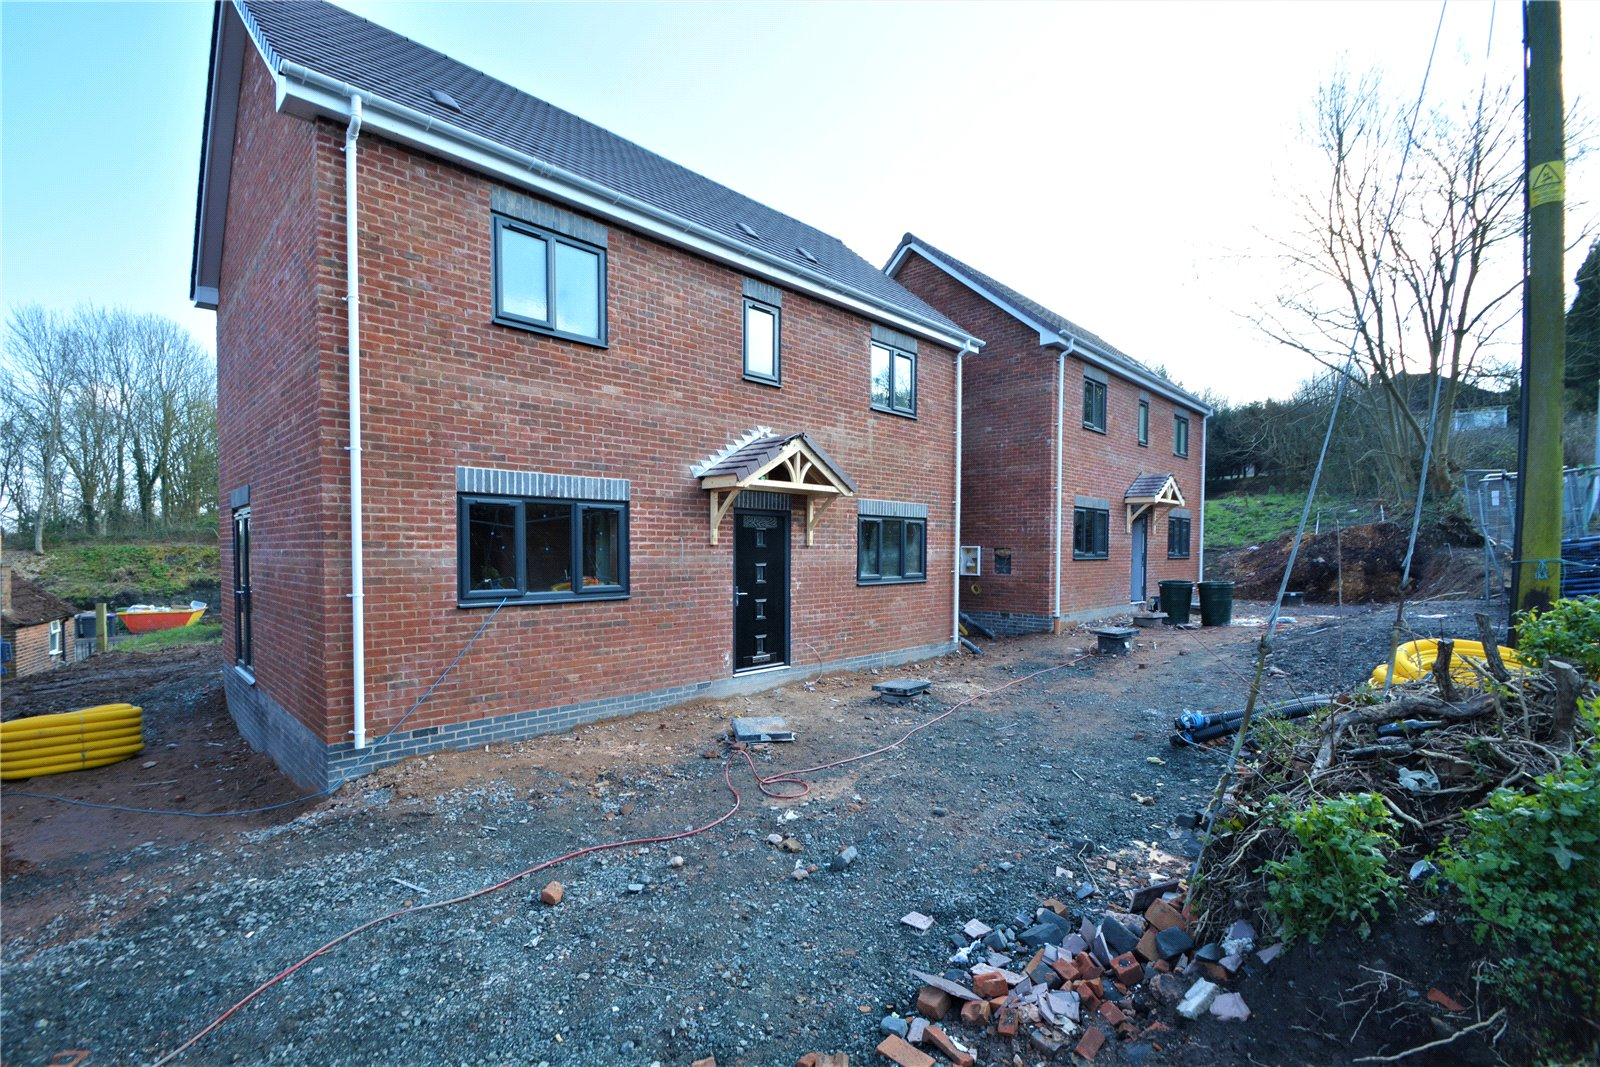 Ivy House, Sunnyside Road, Ketley Bank, Telford, TF2